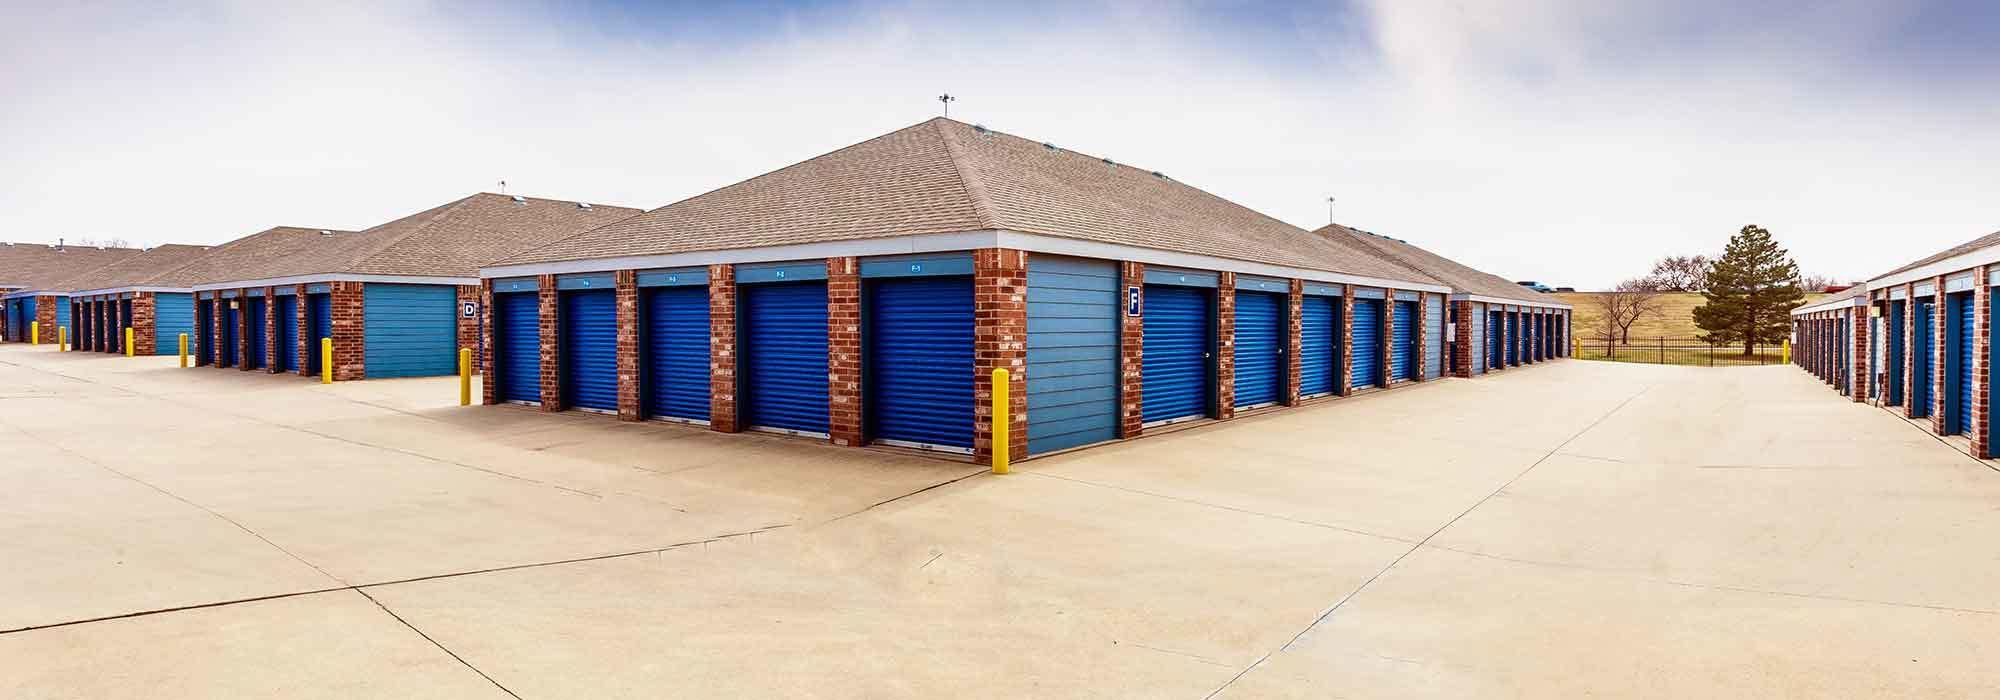 Self storage in Wichita KS